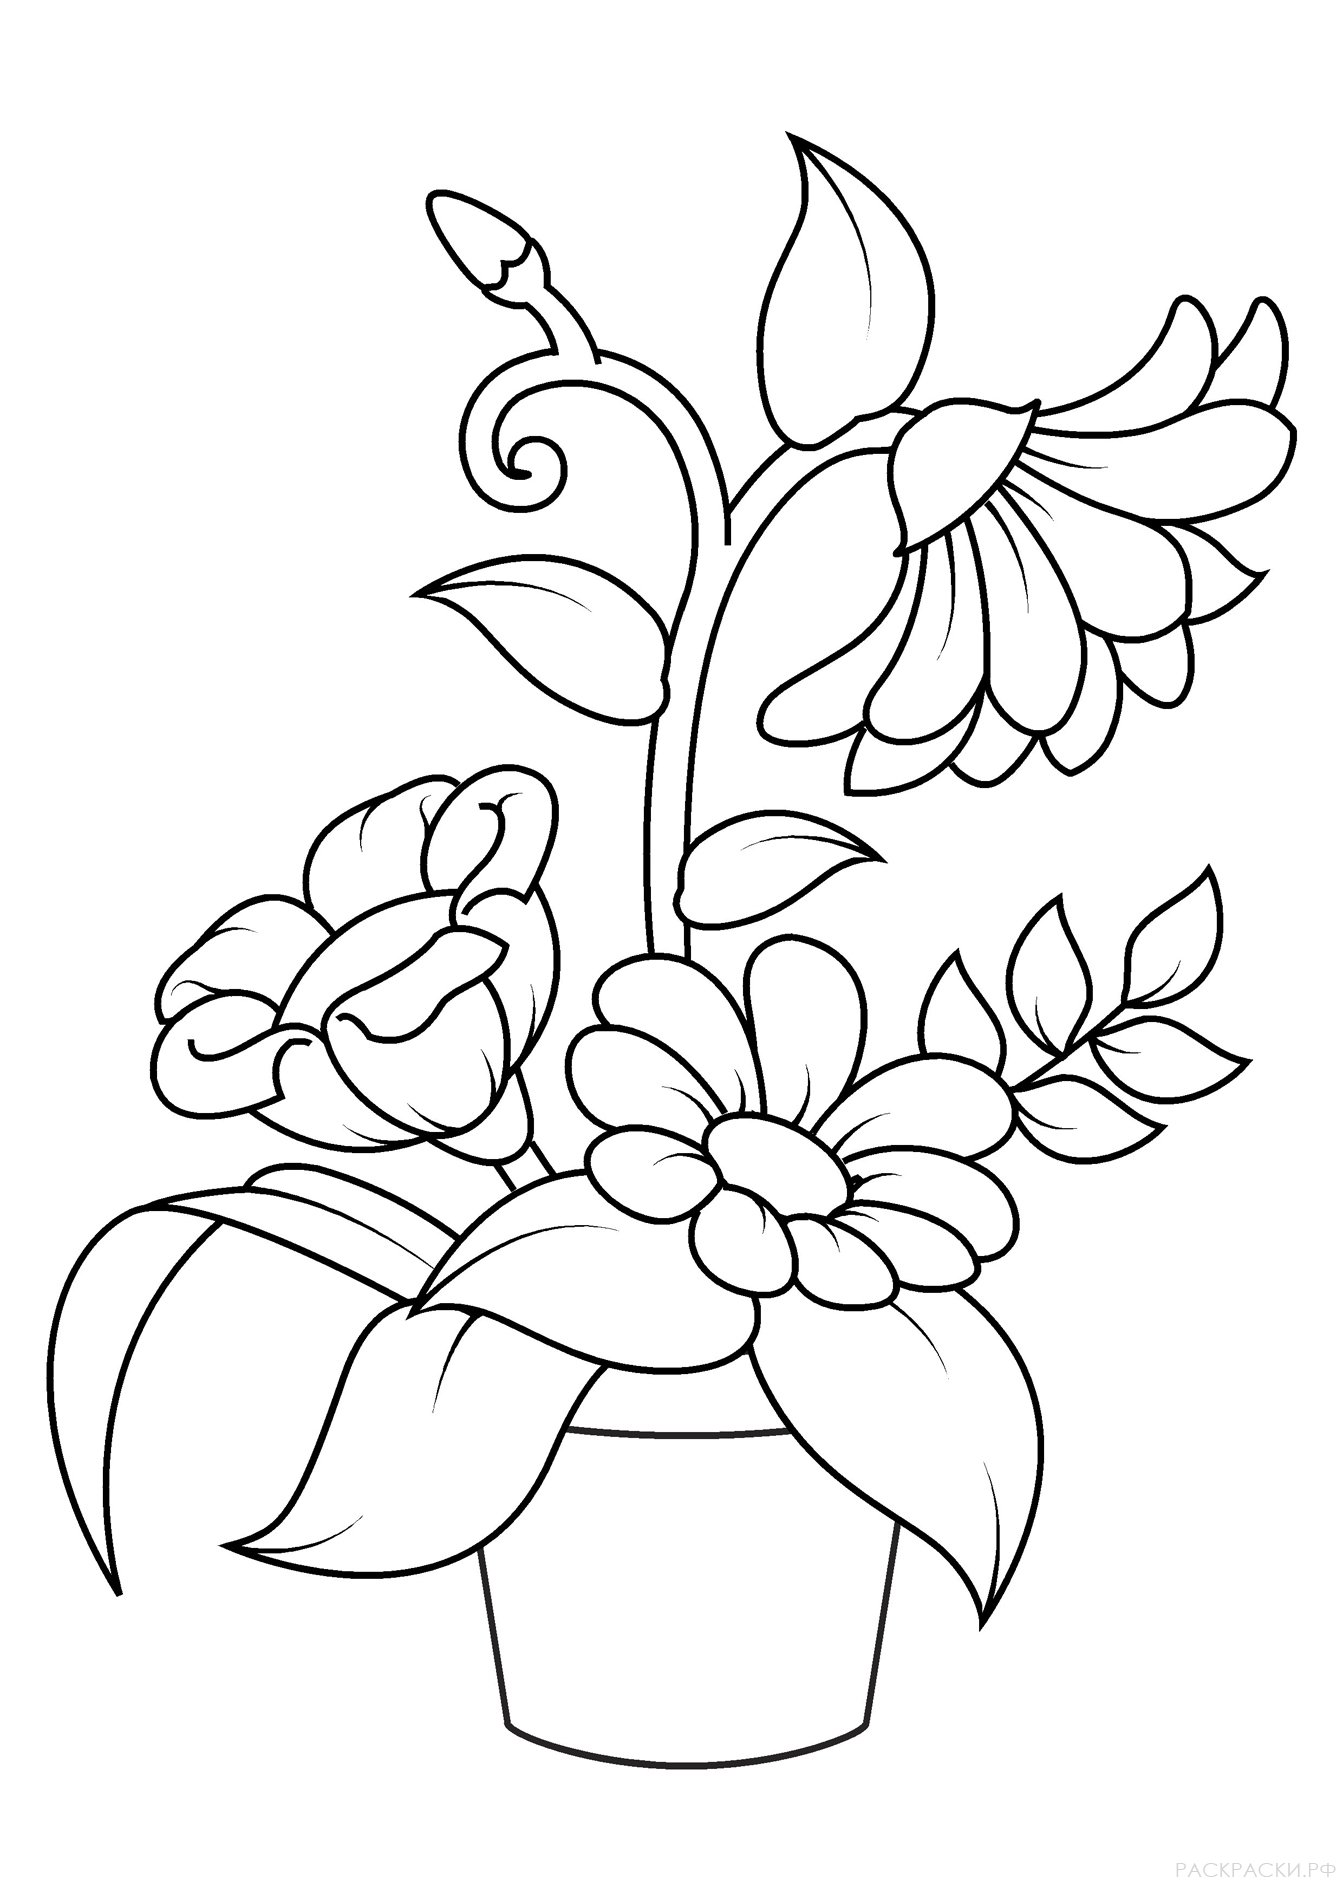 Картинки цветка в горшке раскраски